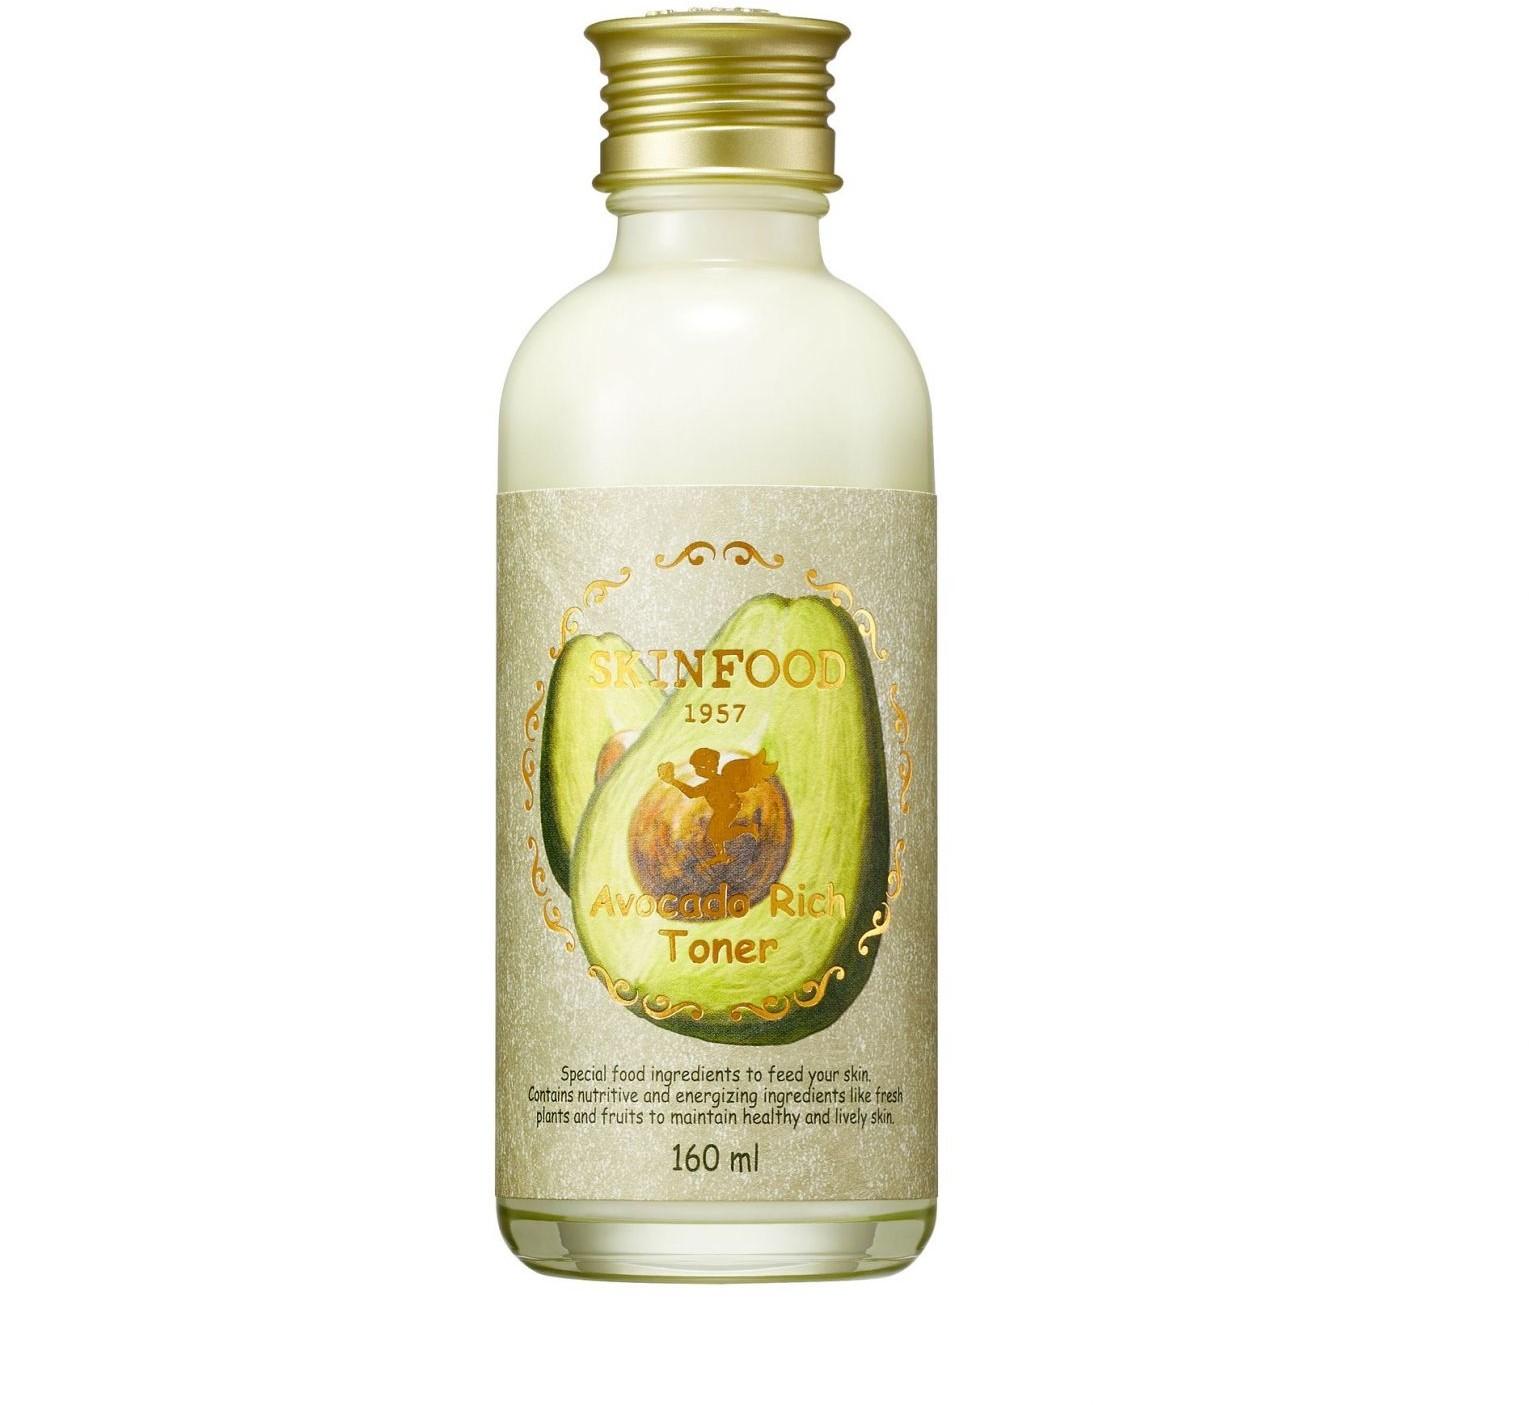 Skinfood Skinfood Avocado Rich Toner   160ml tonik do twarzy z avokado